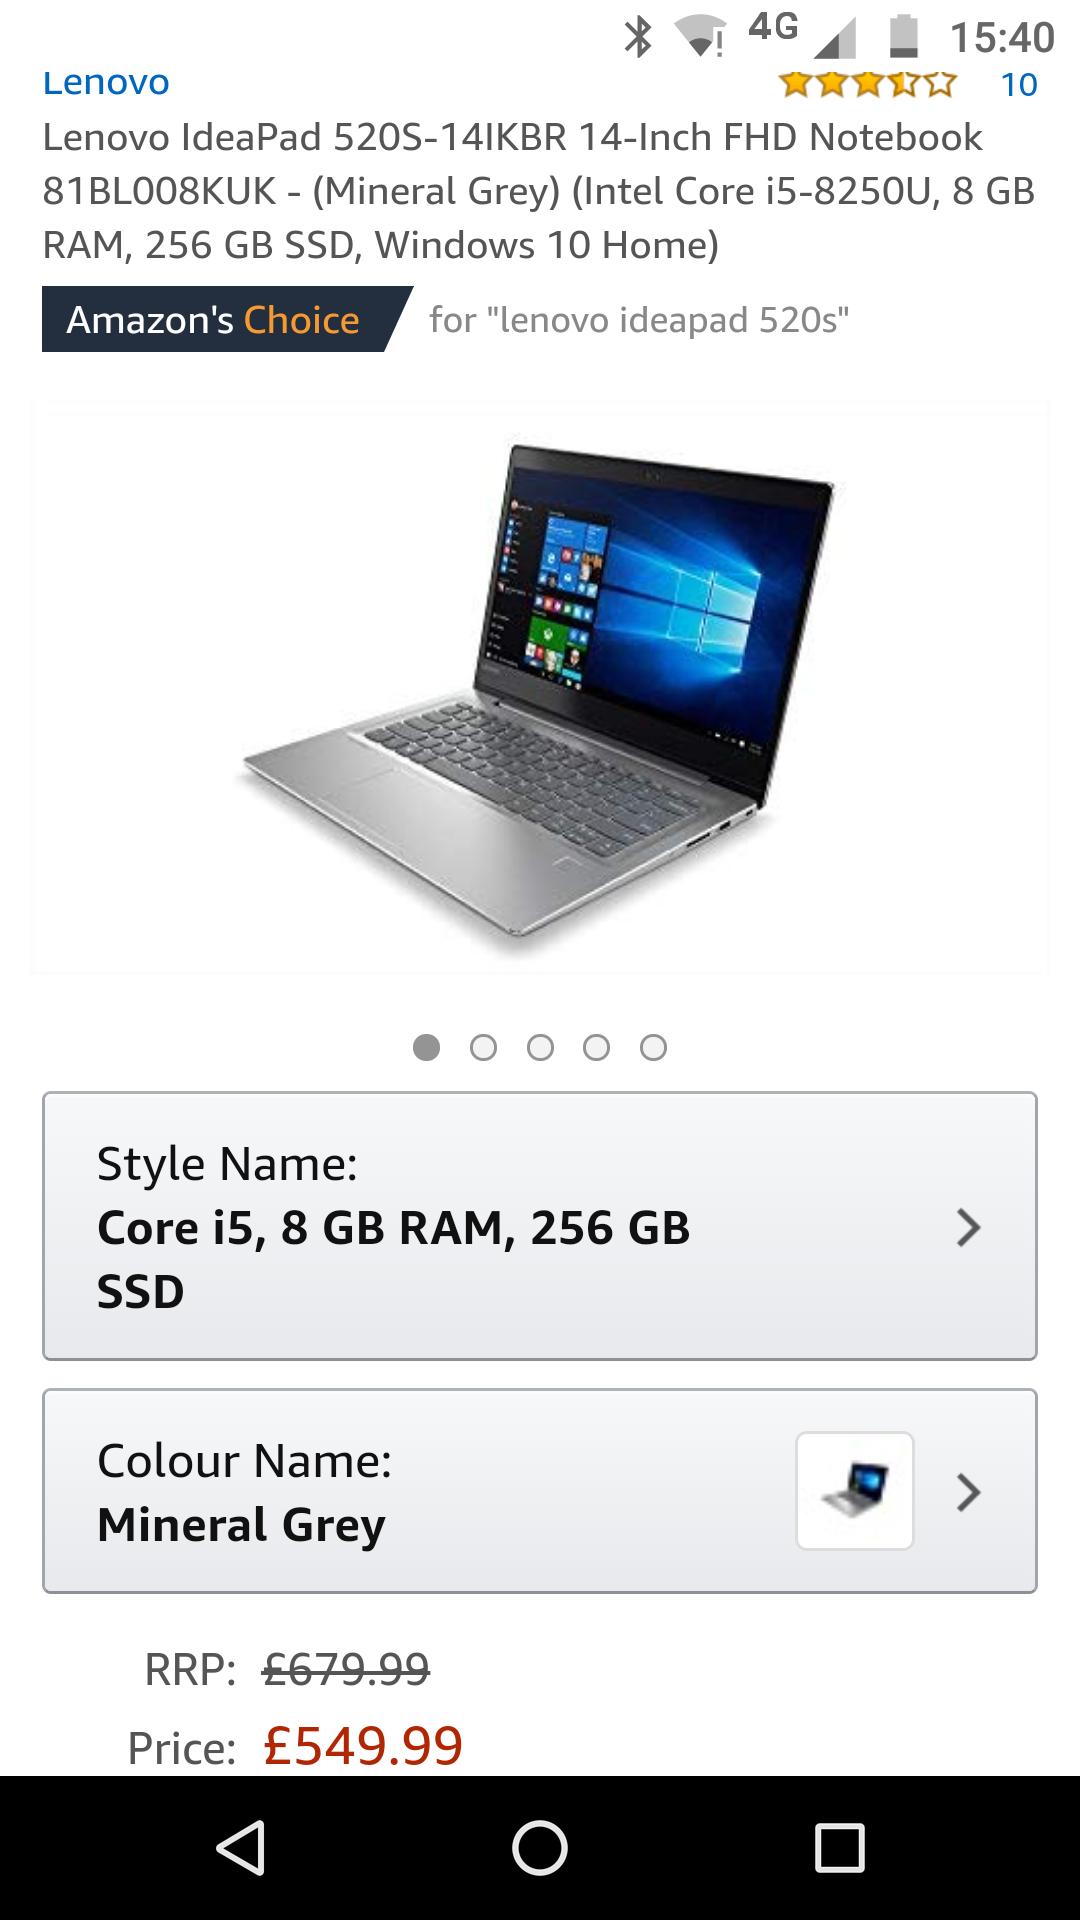 IdeaPad 520s 14-Inch FHD - (Intel Core i5-8250U, 8 GB RAM, 256 GB SSD, laptop £549.99 @ Amazon